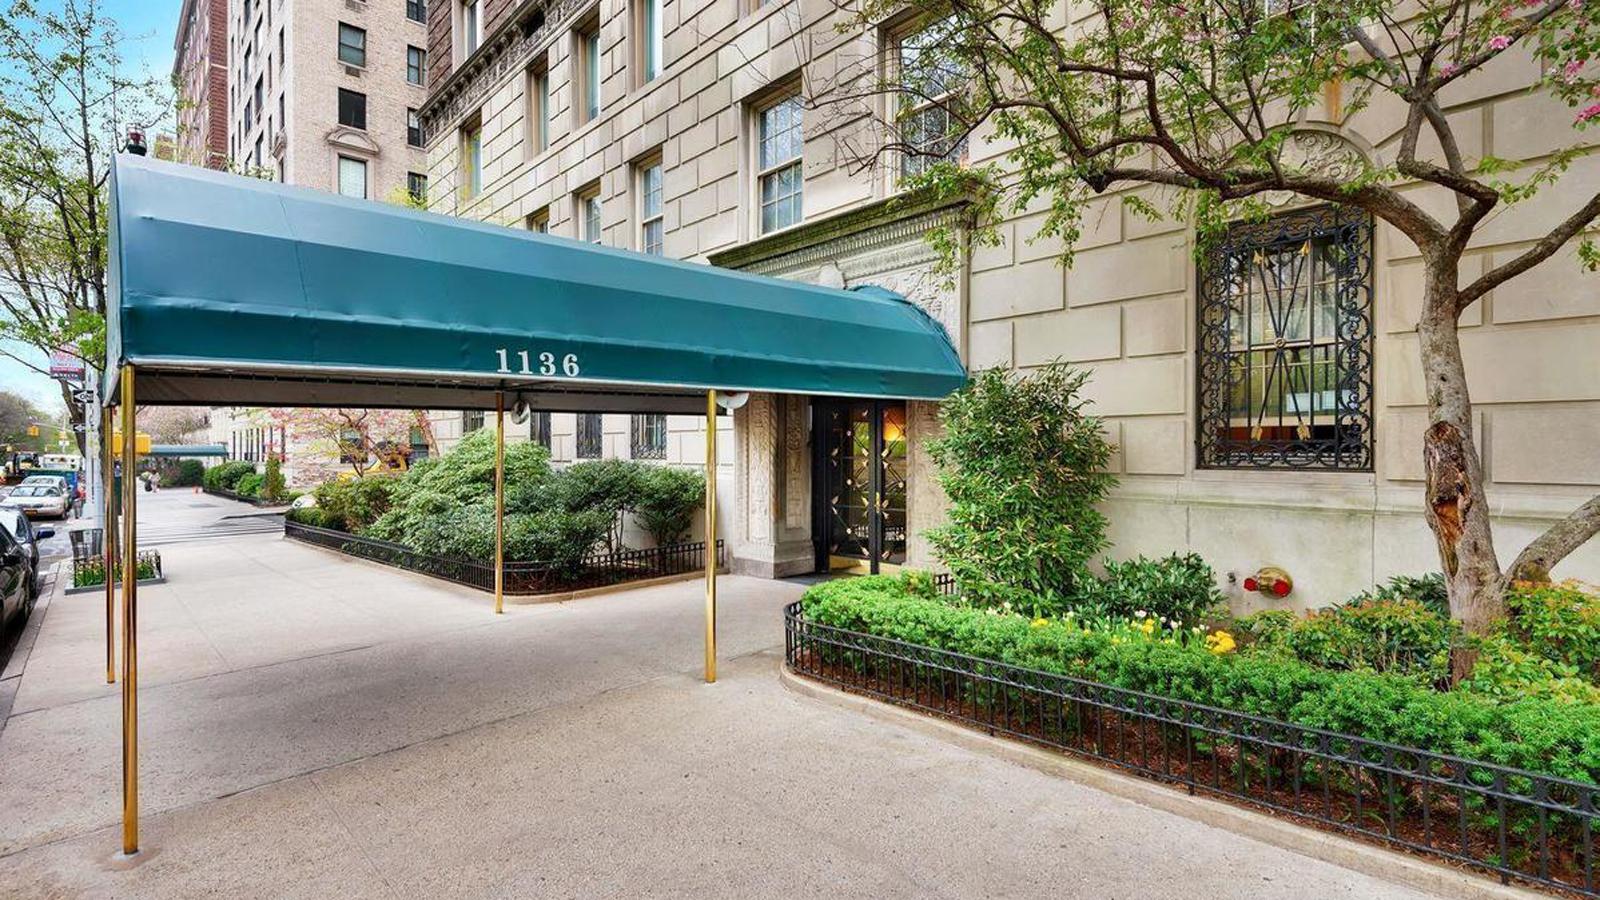 1136 Fifth Avenue